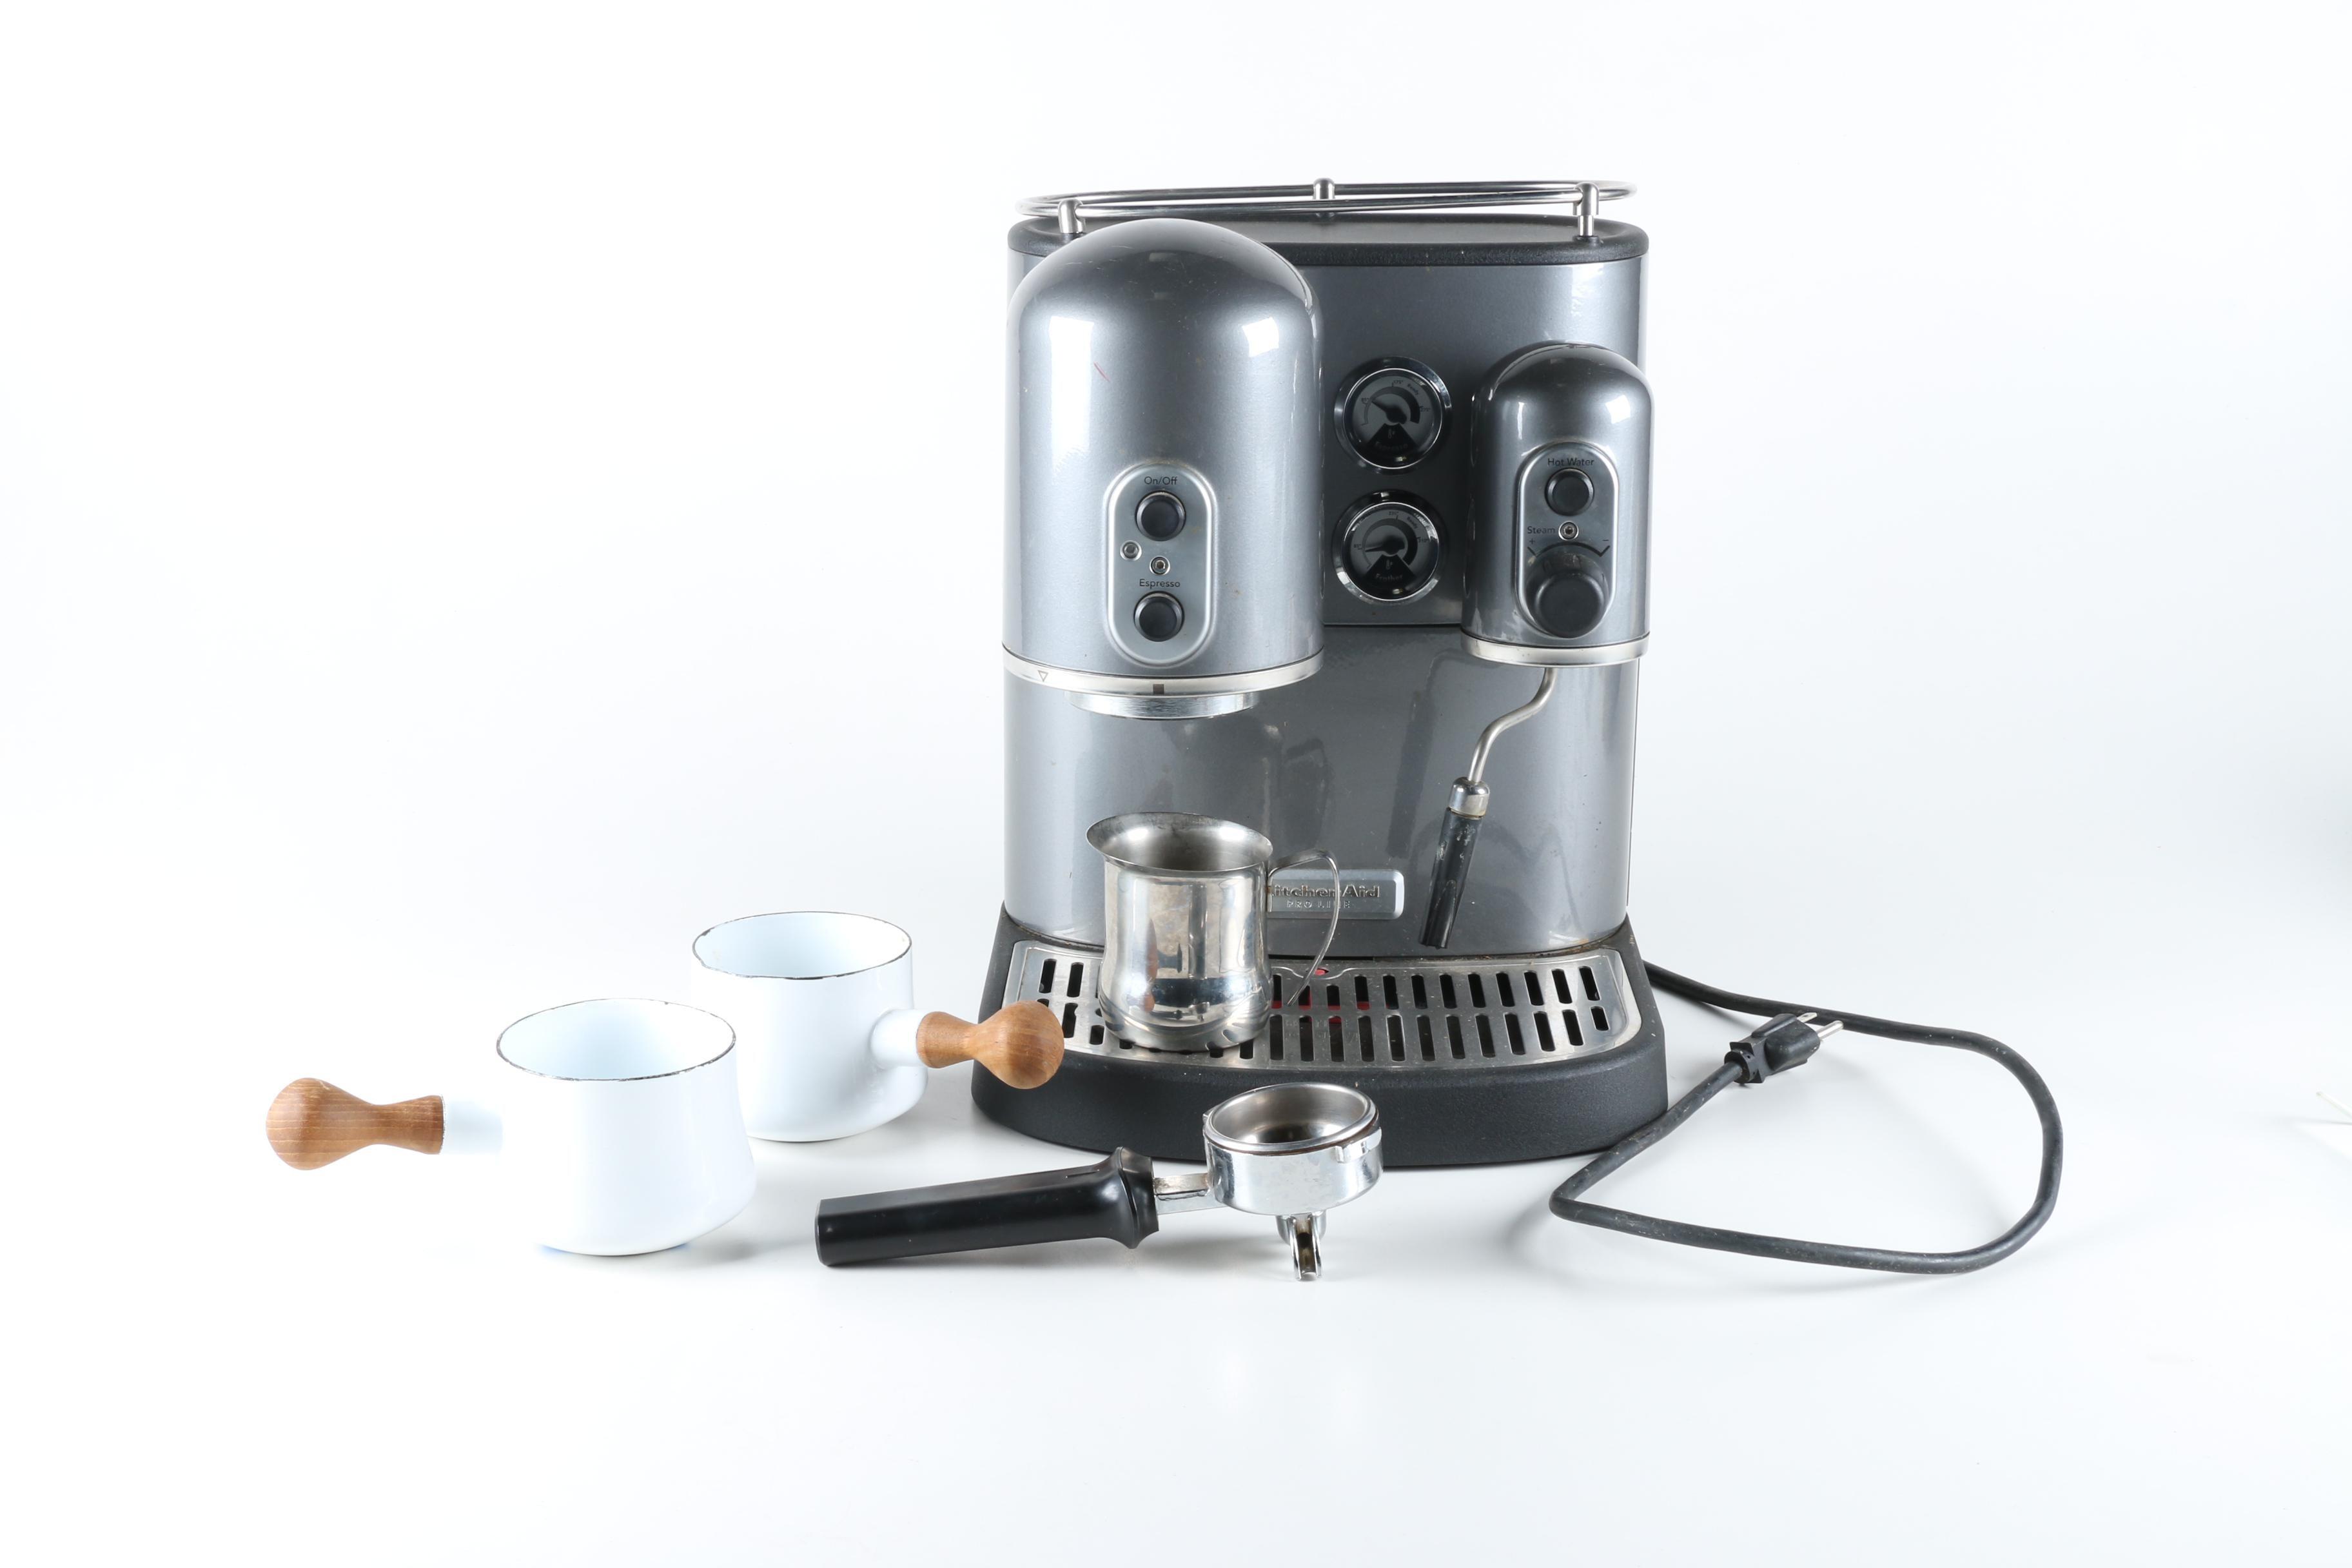 KitchenAid Pro Line Espresso Machine and Accessories